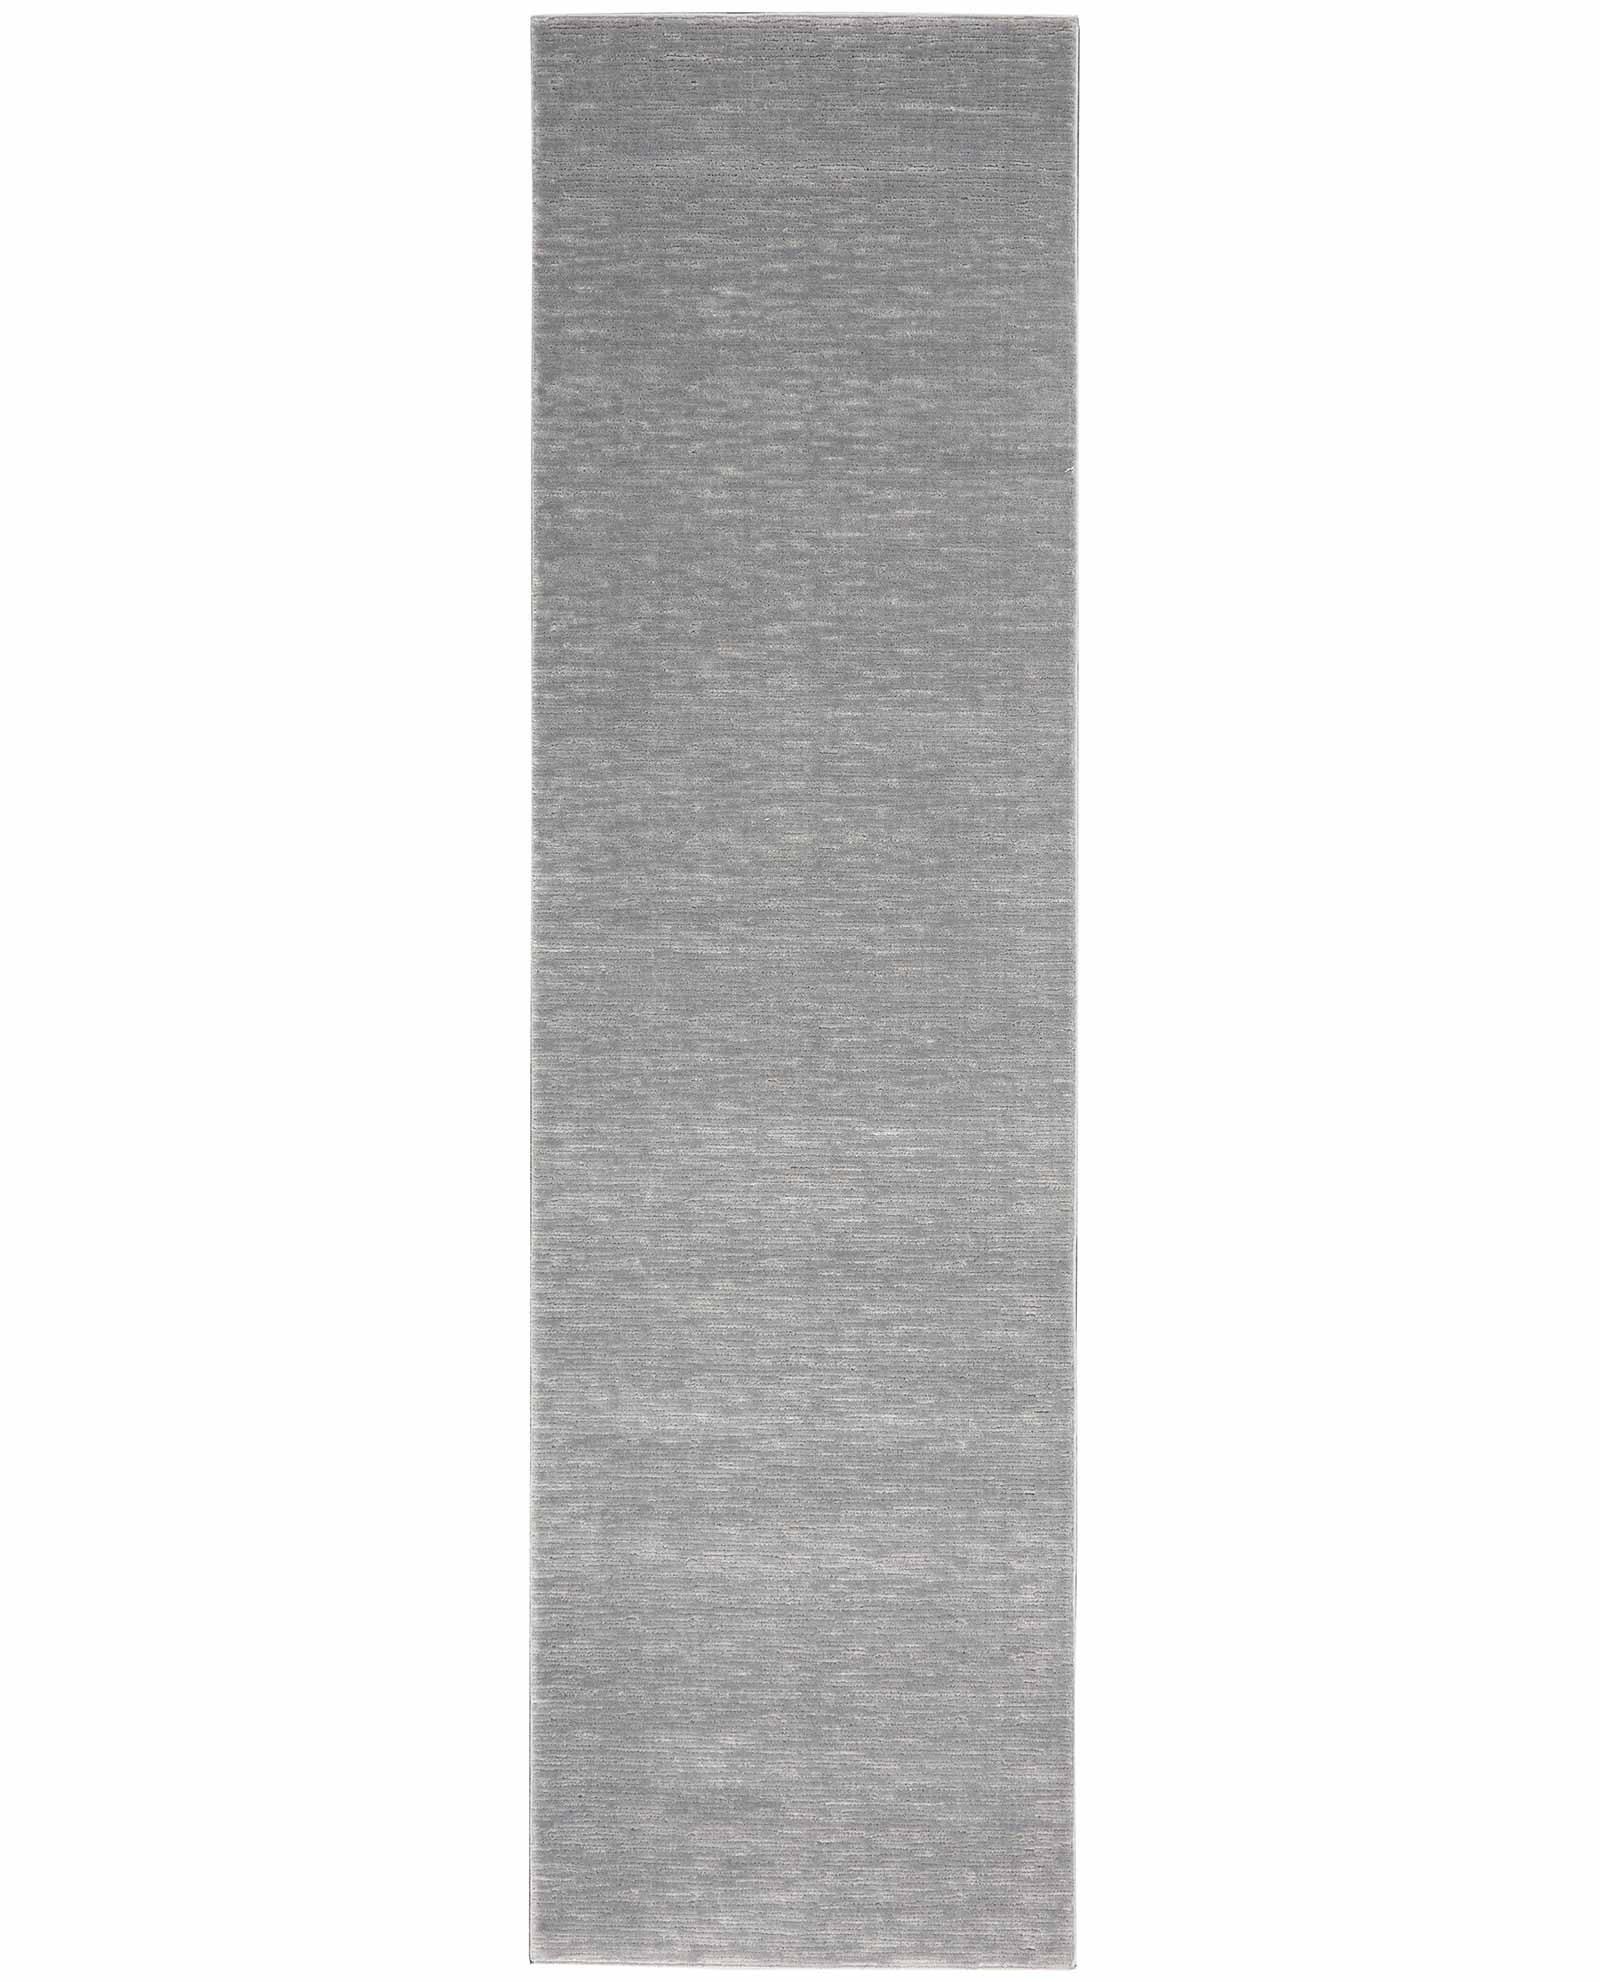 Calvin Klein rug Jackson CK780 CK781 GREY 2x8 099446356239 flat C